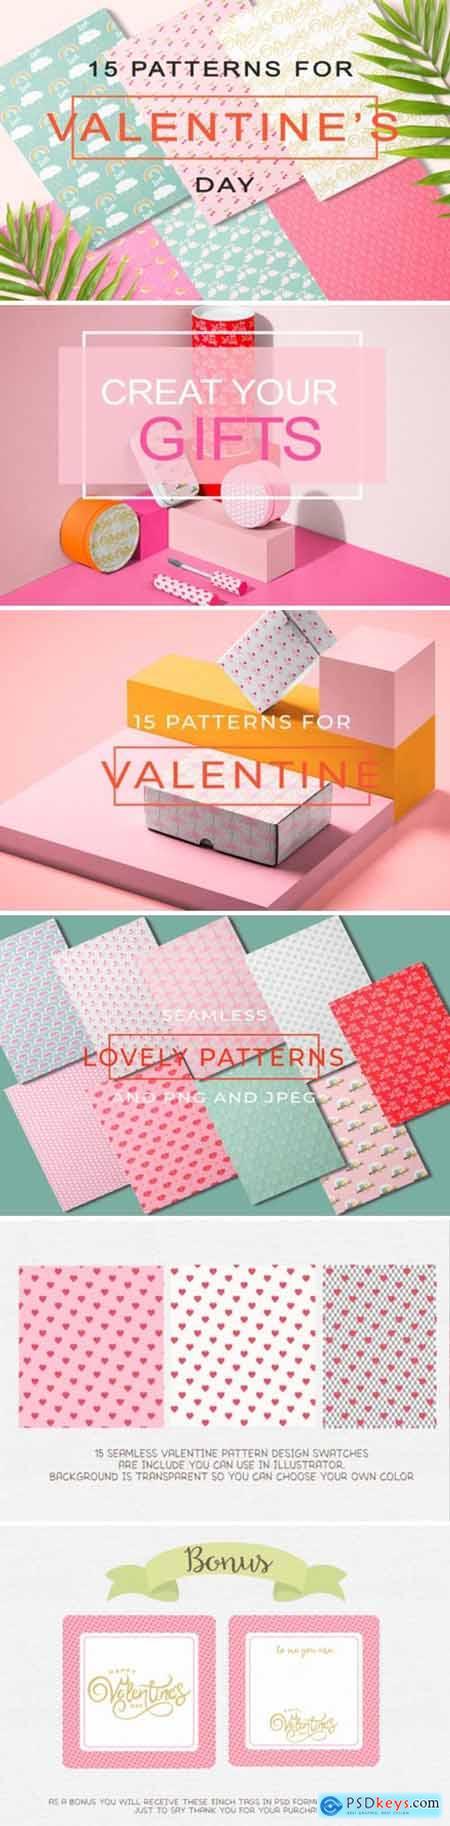 Lovely Valentines Day Pattern 7882368